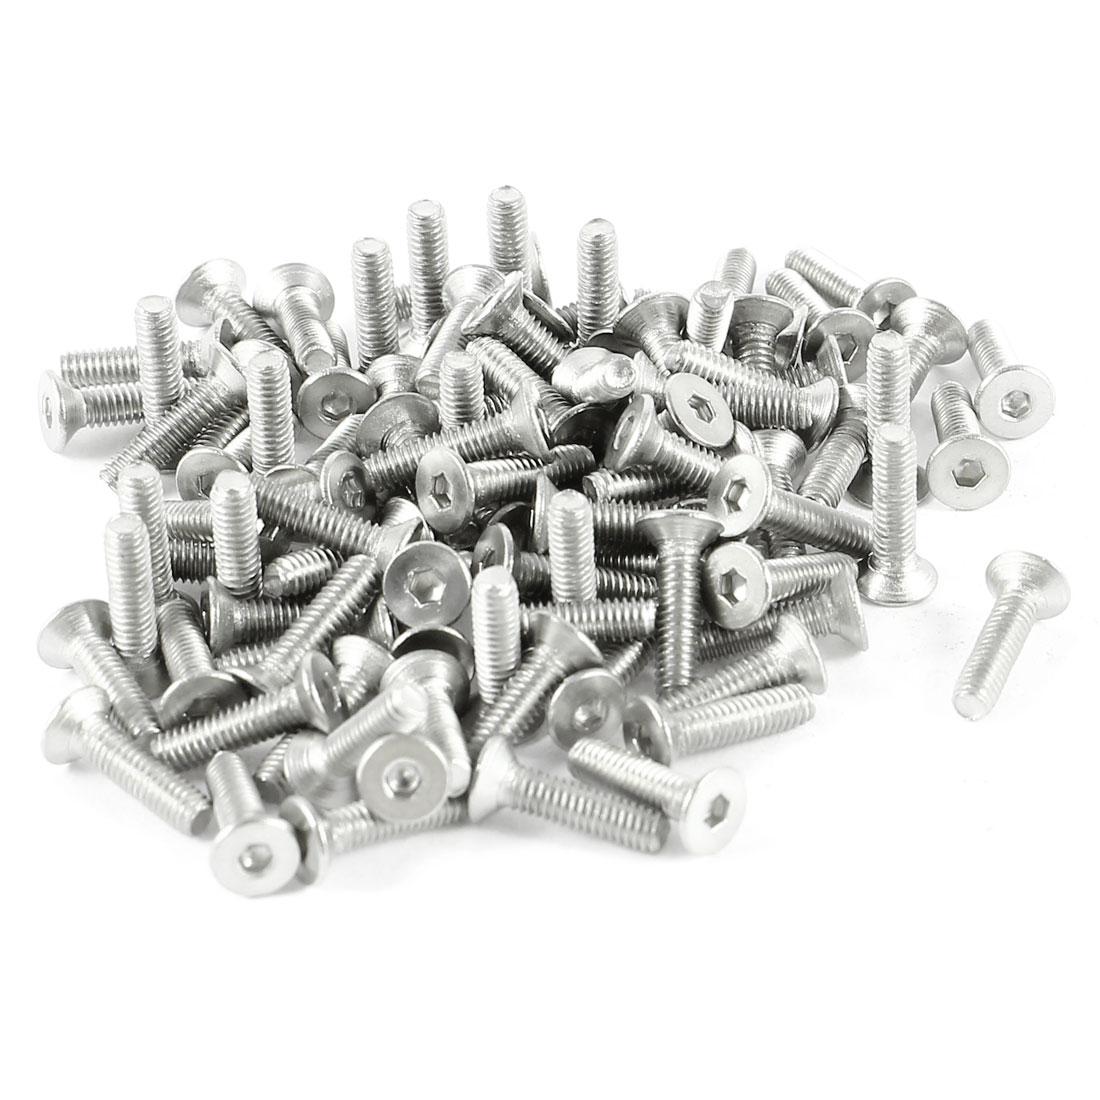 100Pcs 304HC Stainless Steel Countersunk Hex Flat Head Key Bolts Screws M2.5 x 10mm